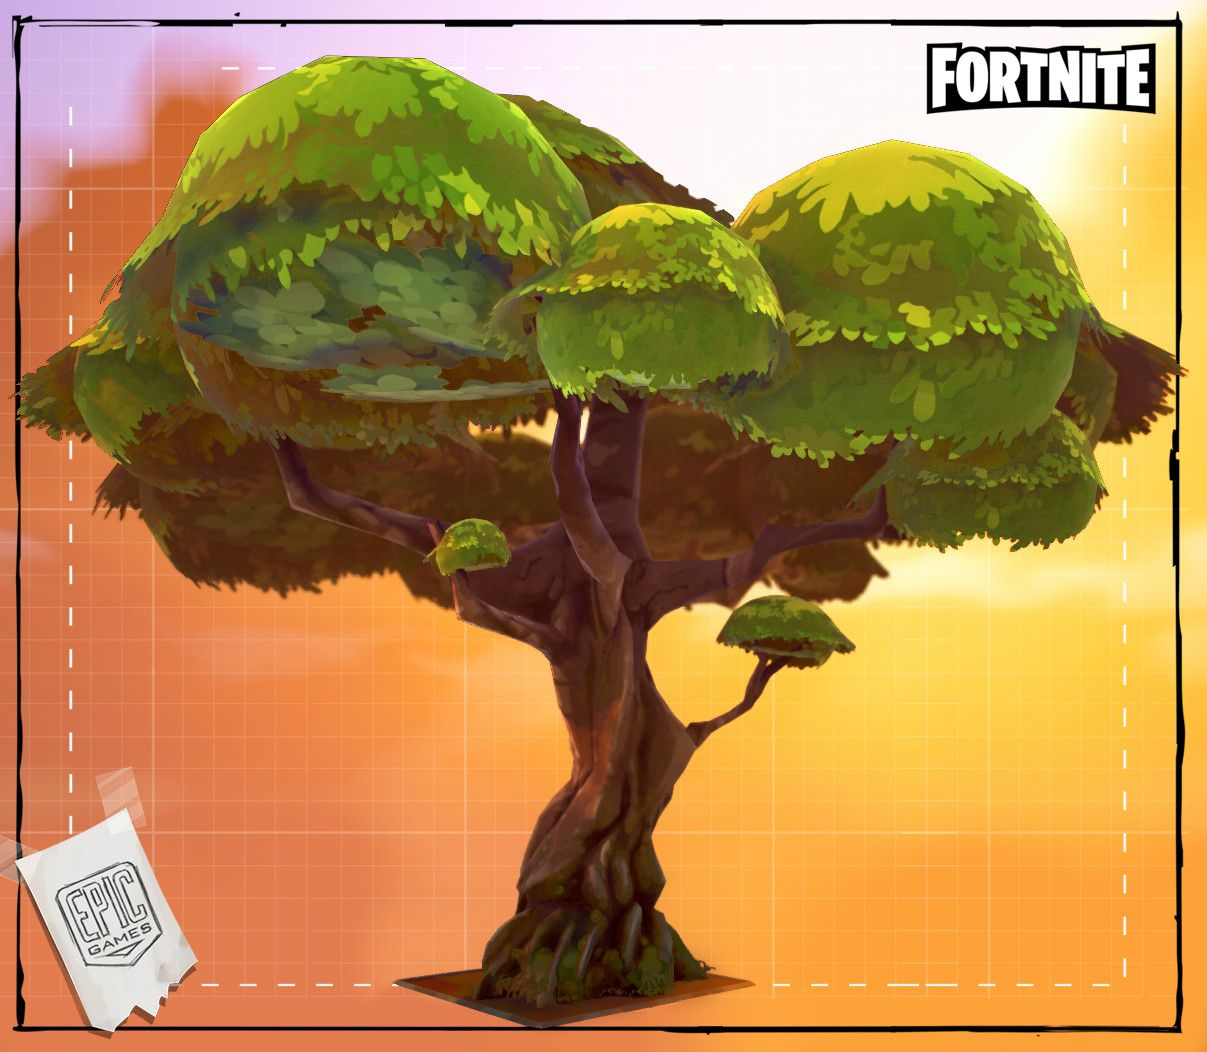 artstation fortnite trees 2014 tangi bodio - fortnite tree skin